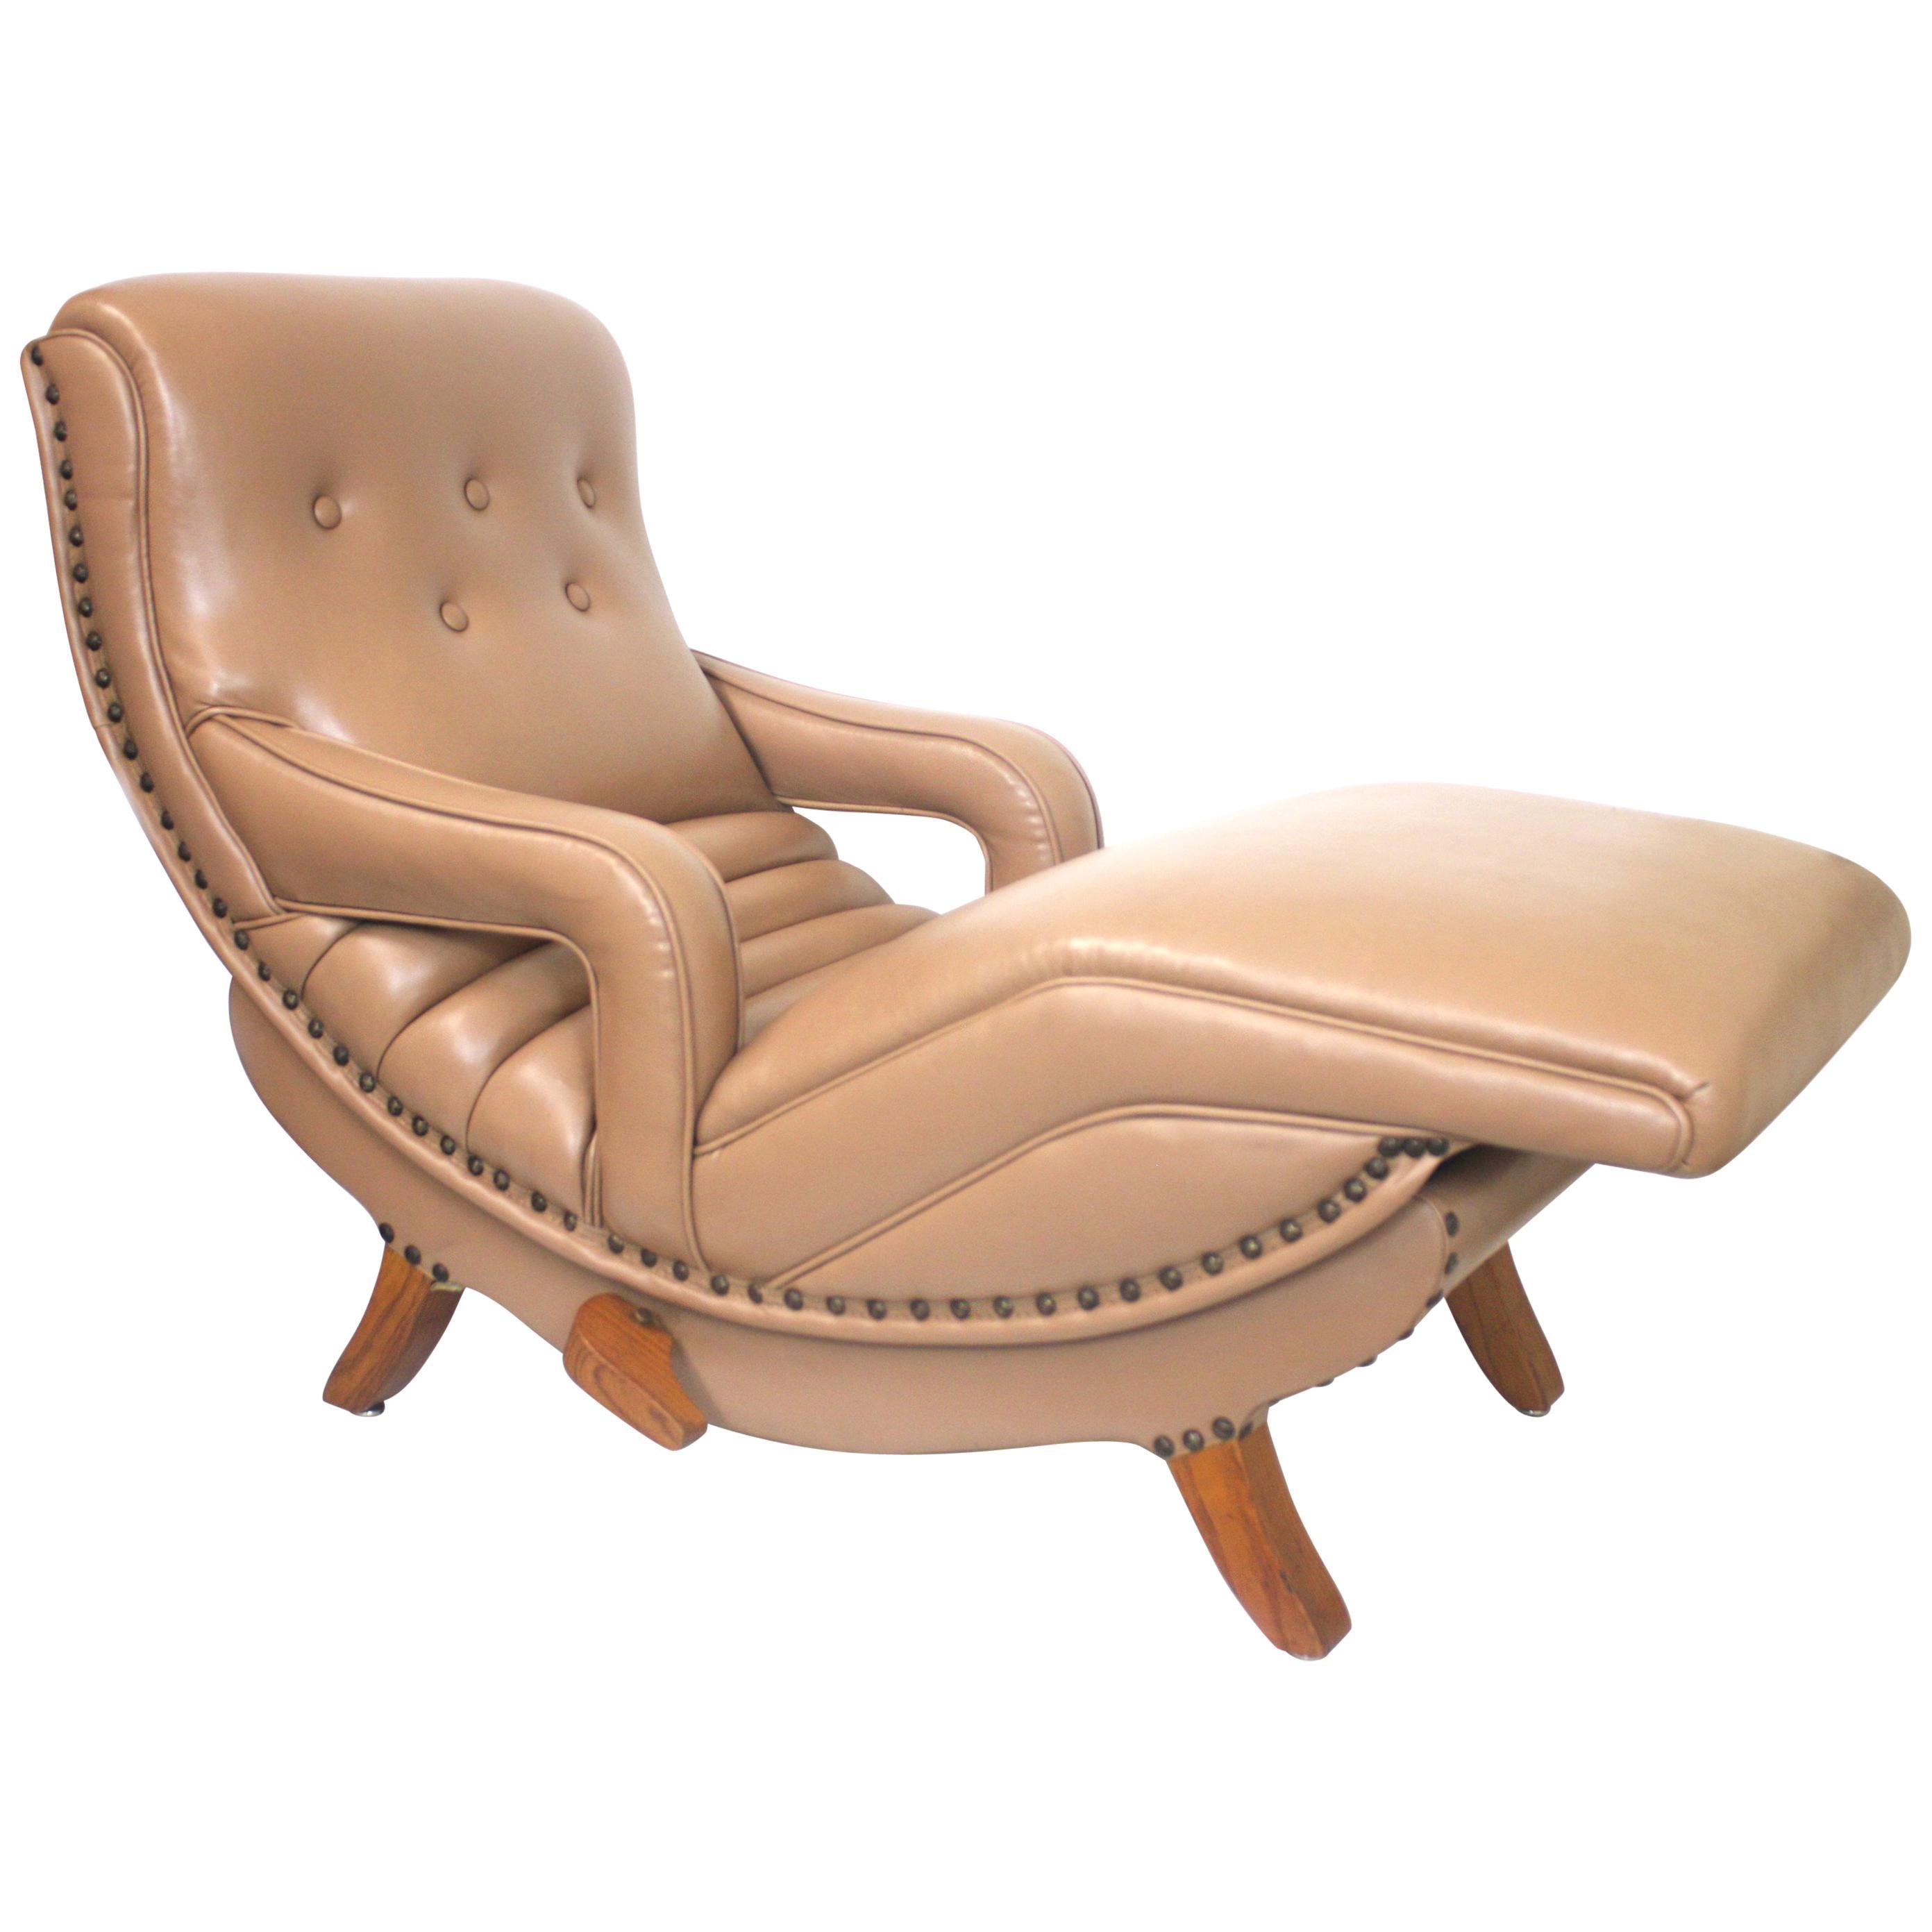 Marvelous Rare Mid Century Modern Child Size Miniature 3 4 Scale Contour Lounge Chair Alphanode Cool Chair Designs And Ideas Alphanodeonline